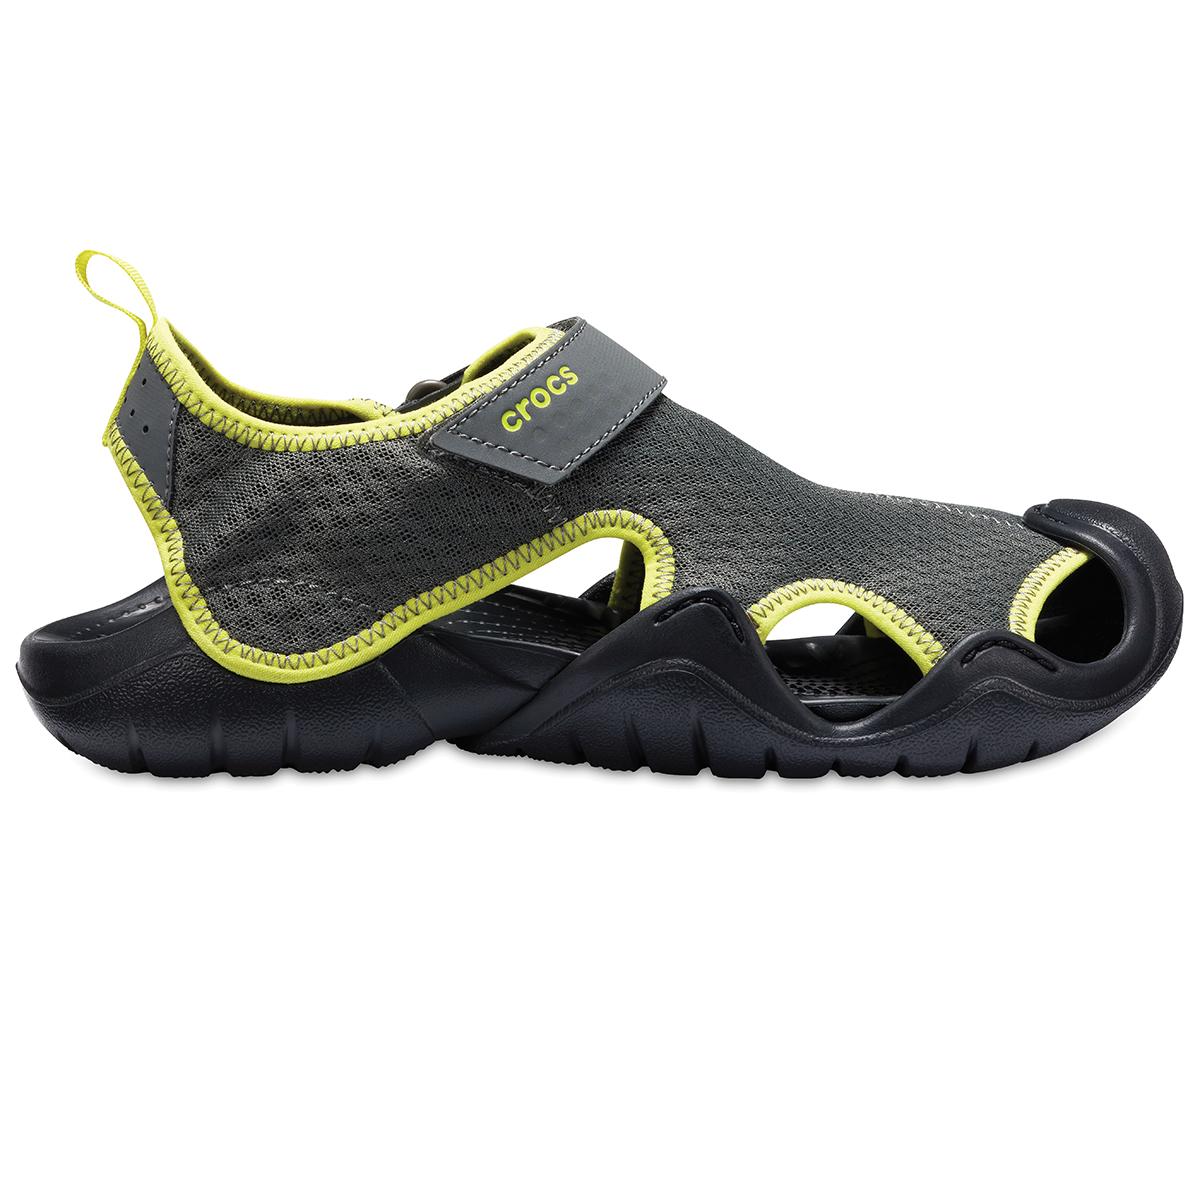 Crocs Swiftwater Sandal M - Barut Rengi/Tenis Topu Yeşili